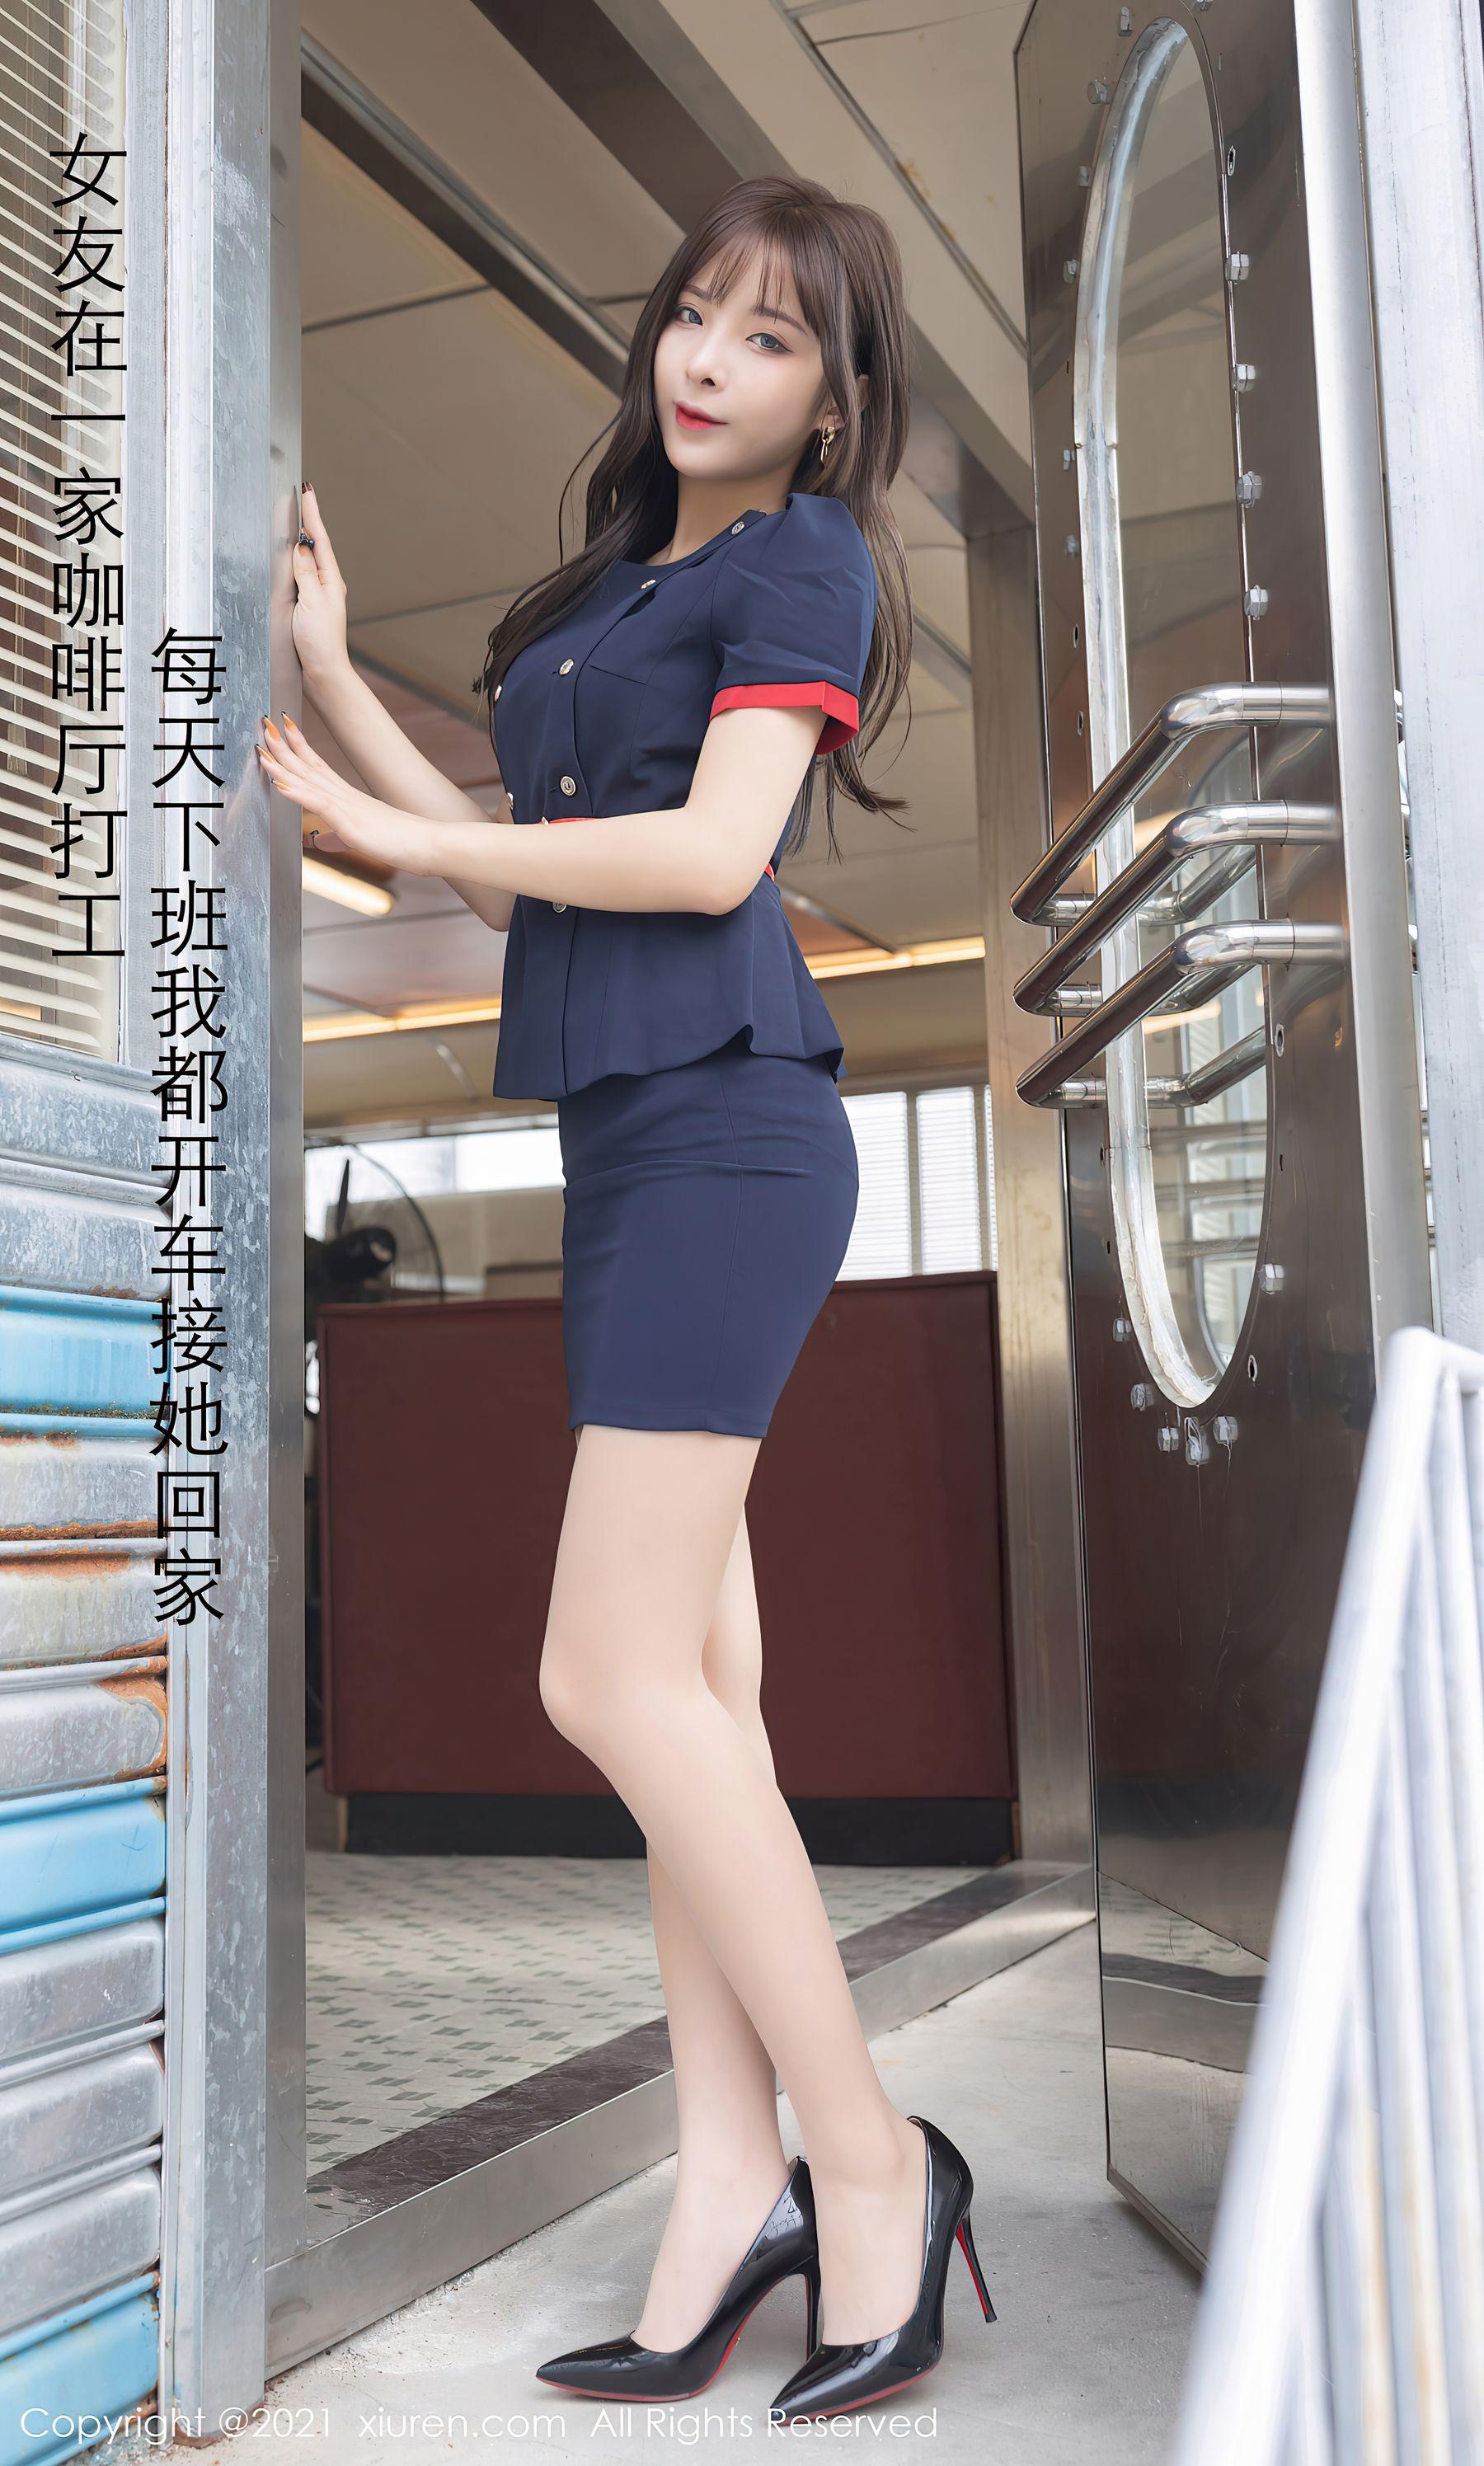 VOL.1319 [秀人网]职业装制服诱惑丝袜制服:陈小喵(陈小喵Aurora,原天夕子)超高清写真套图(66P)